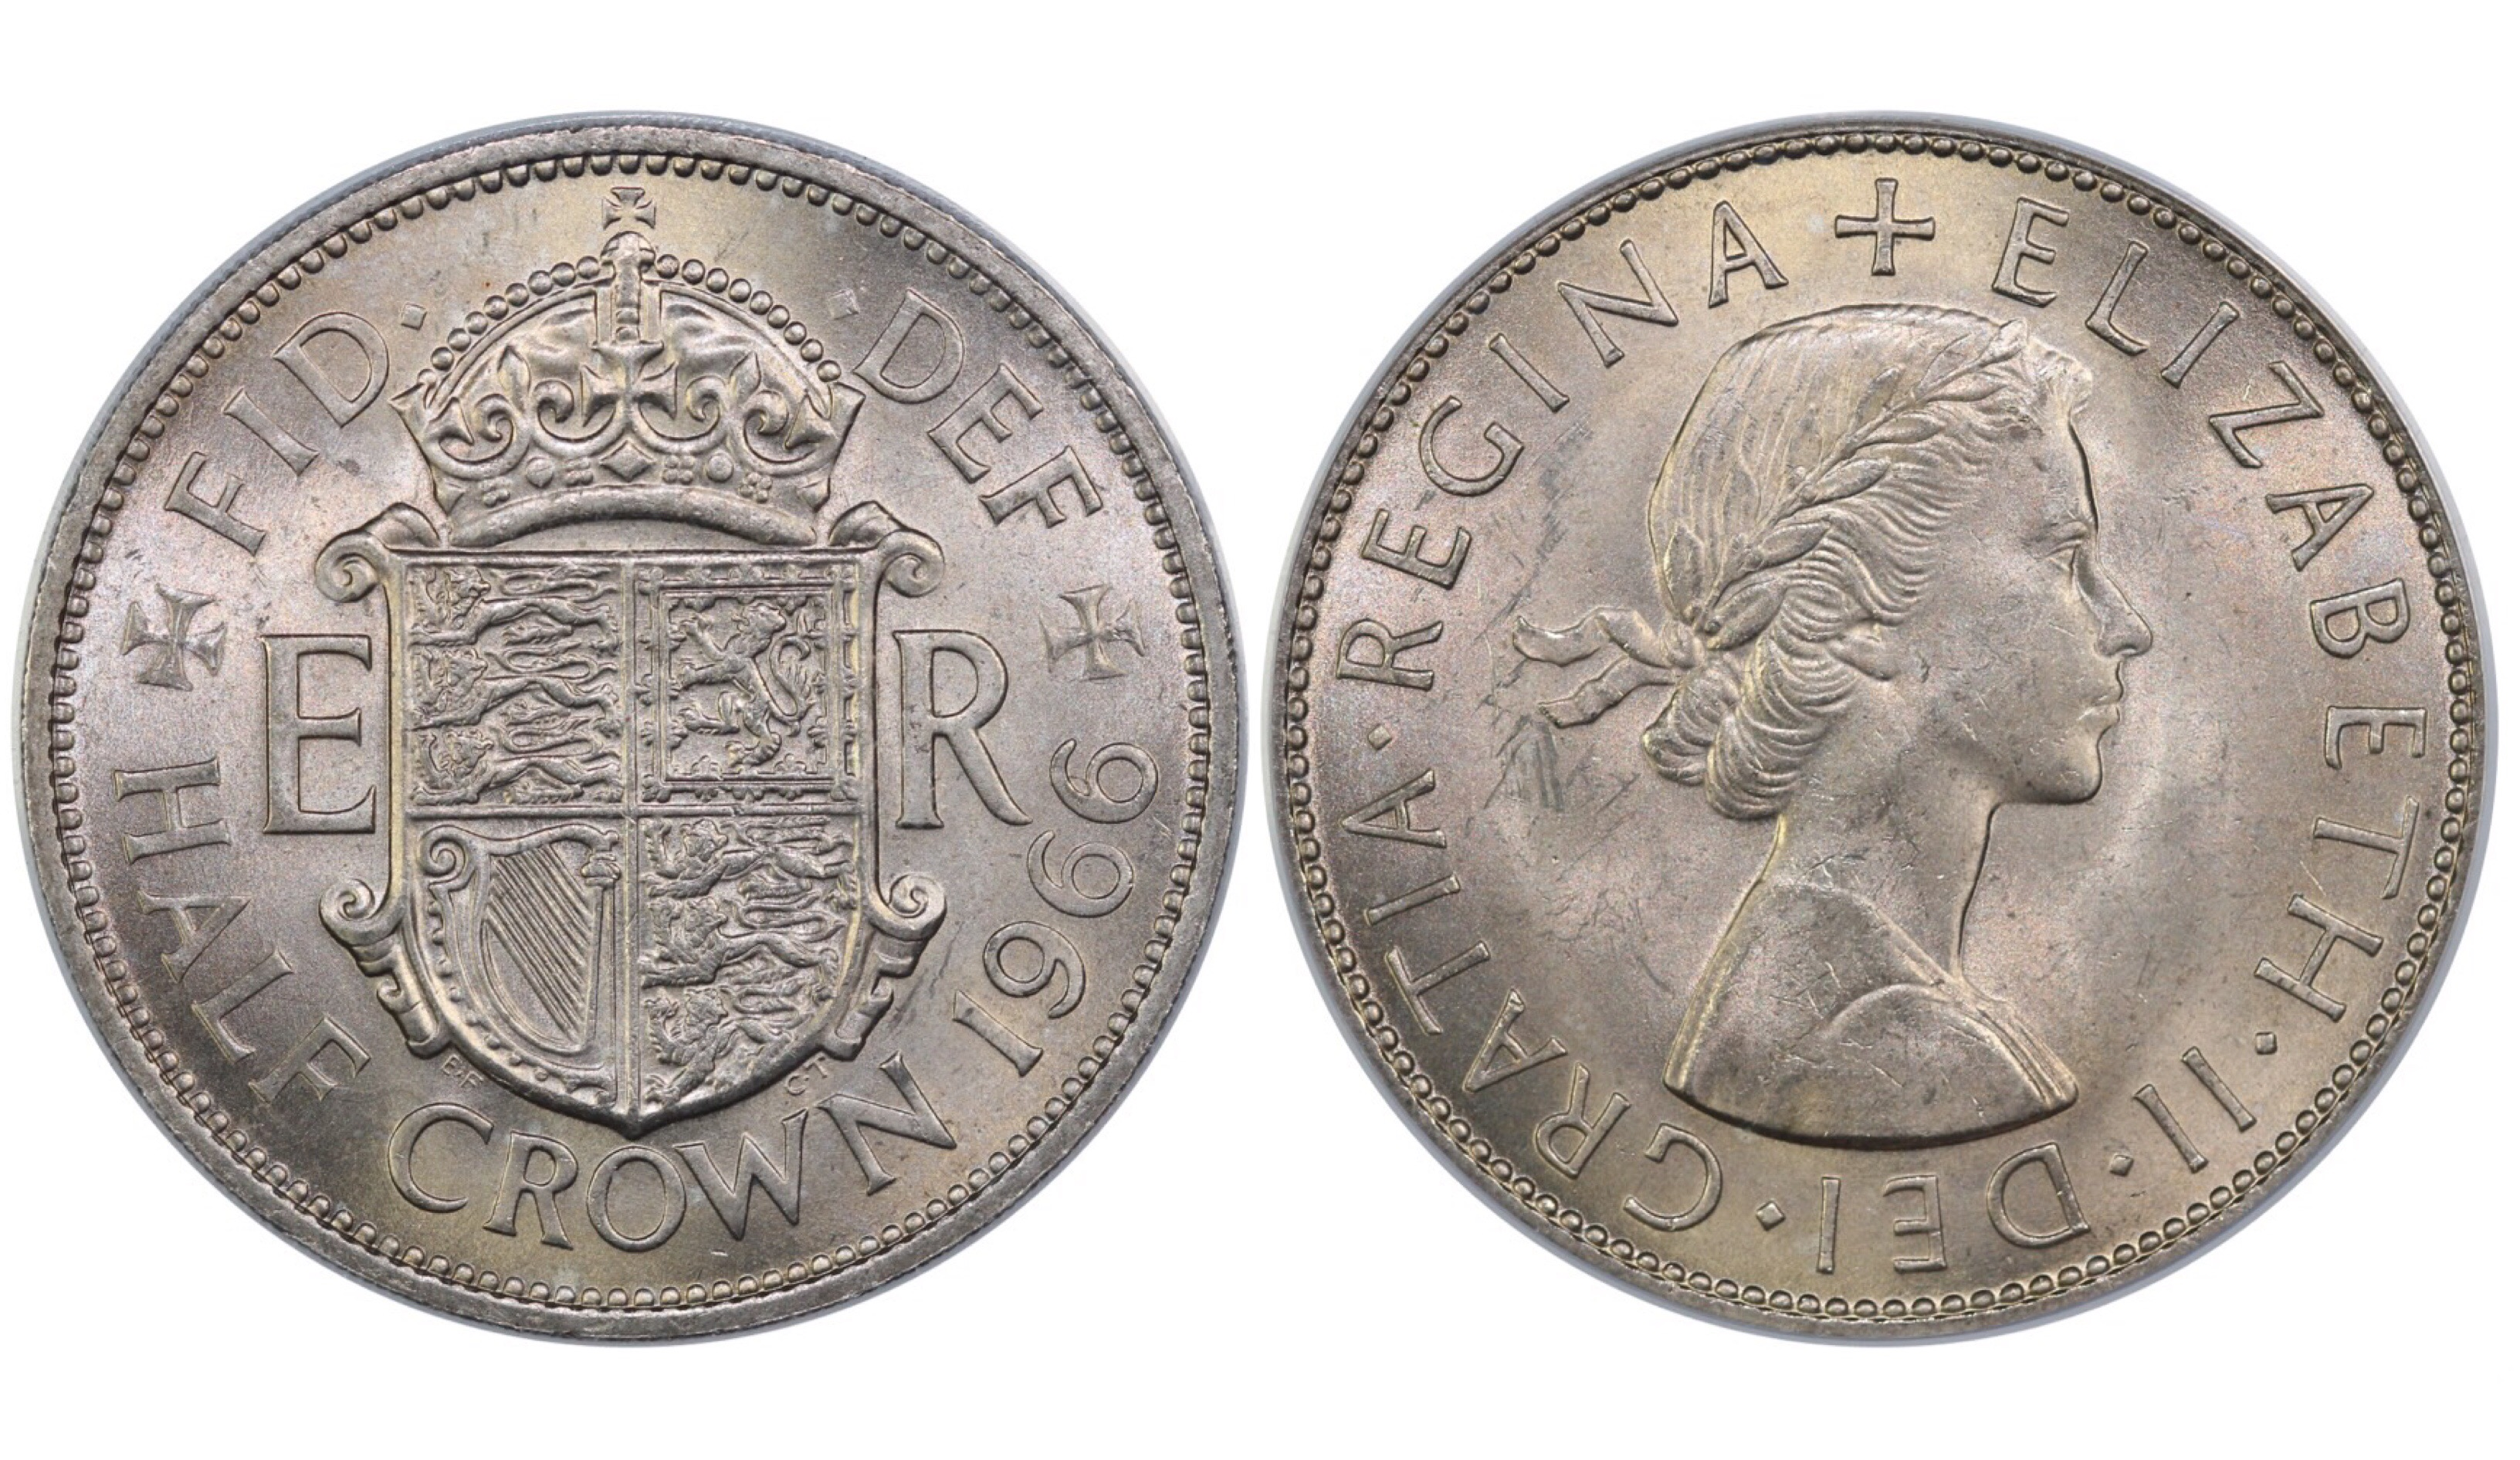 1966 Halfcrown, CGS 78 Elizabeth II, ESC 798W, UIN 15485